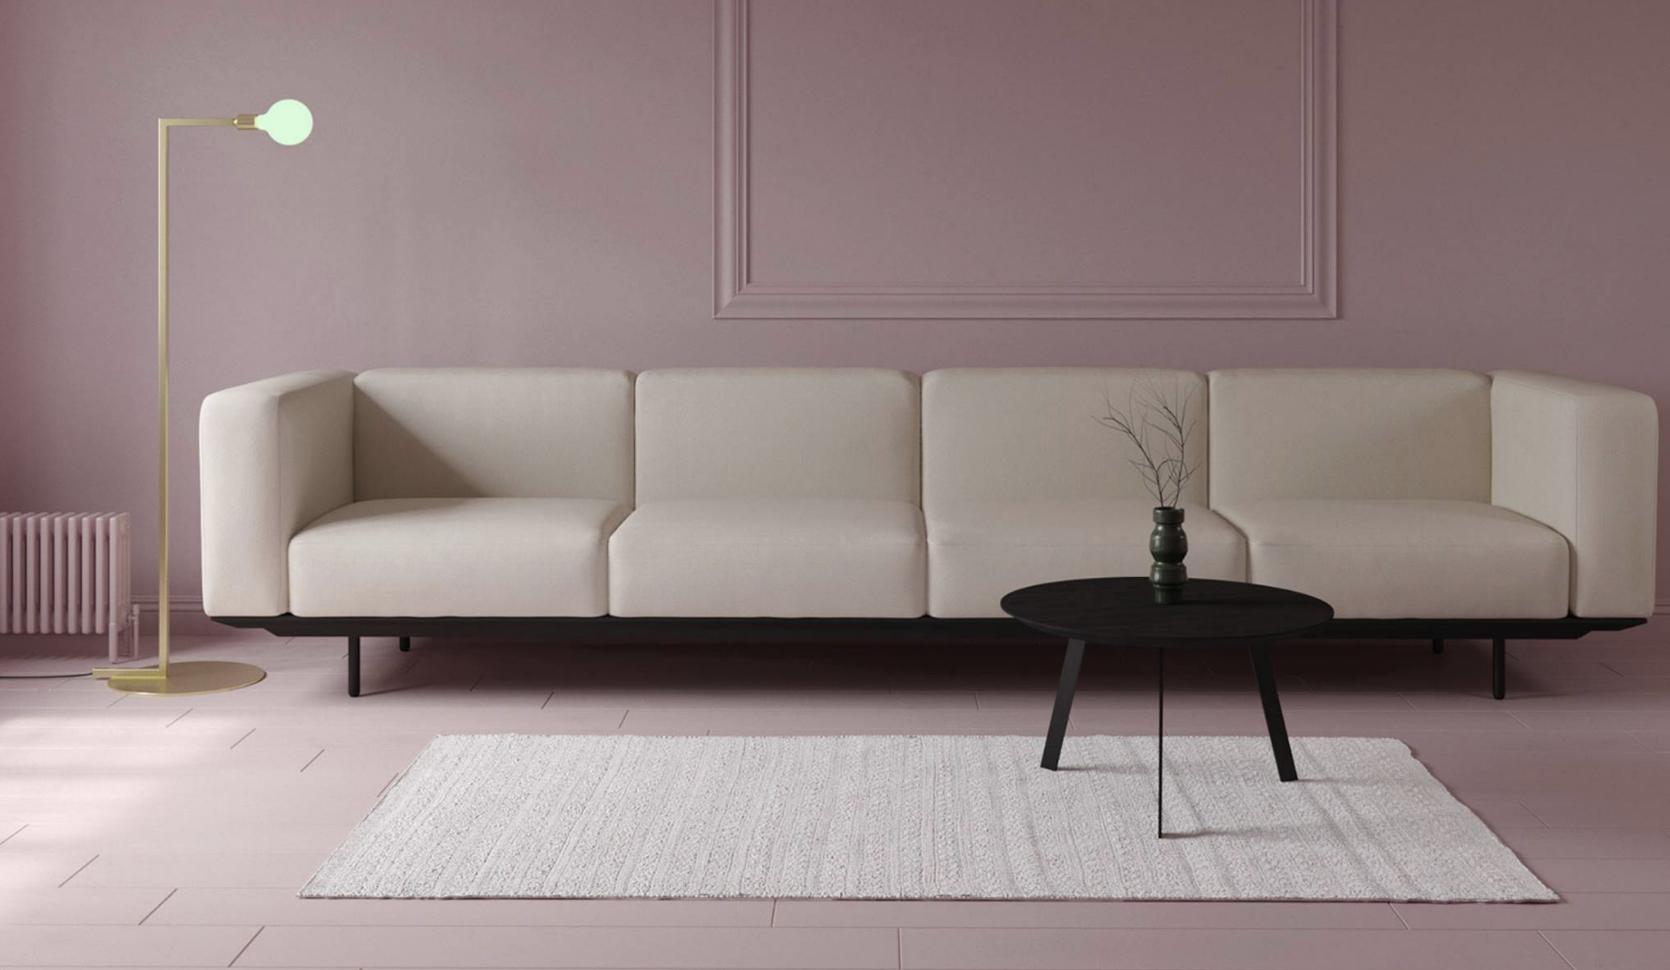 Giuseppe design zitbank 4 zits studio h&k design eettafels